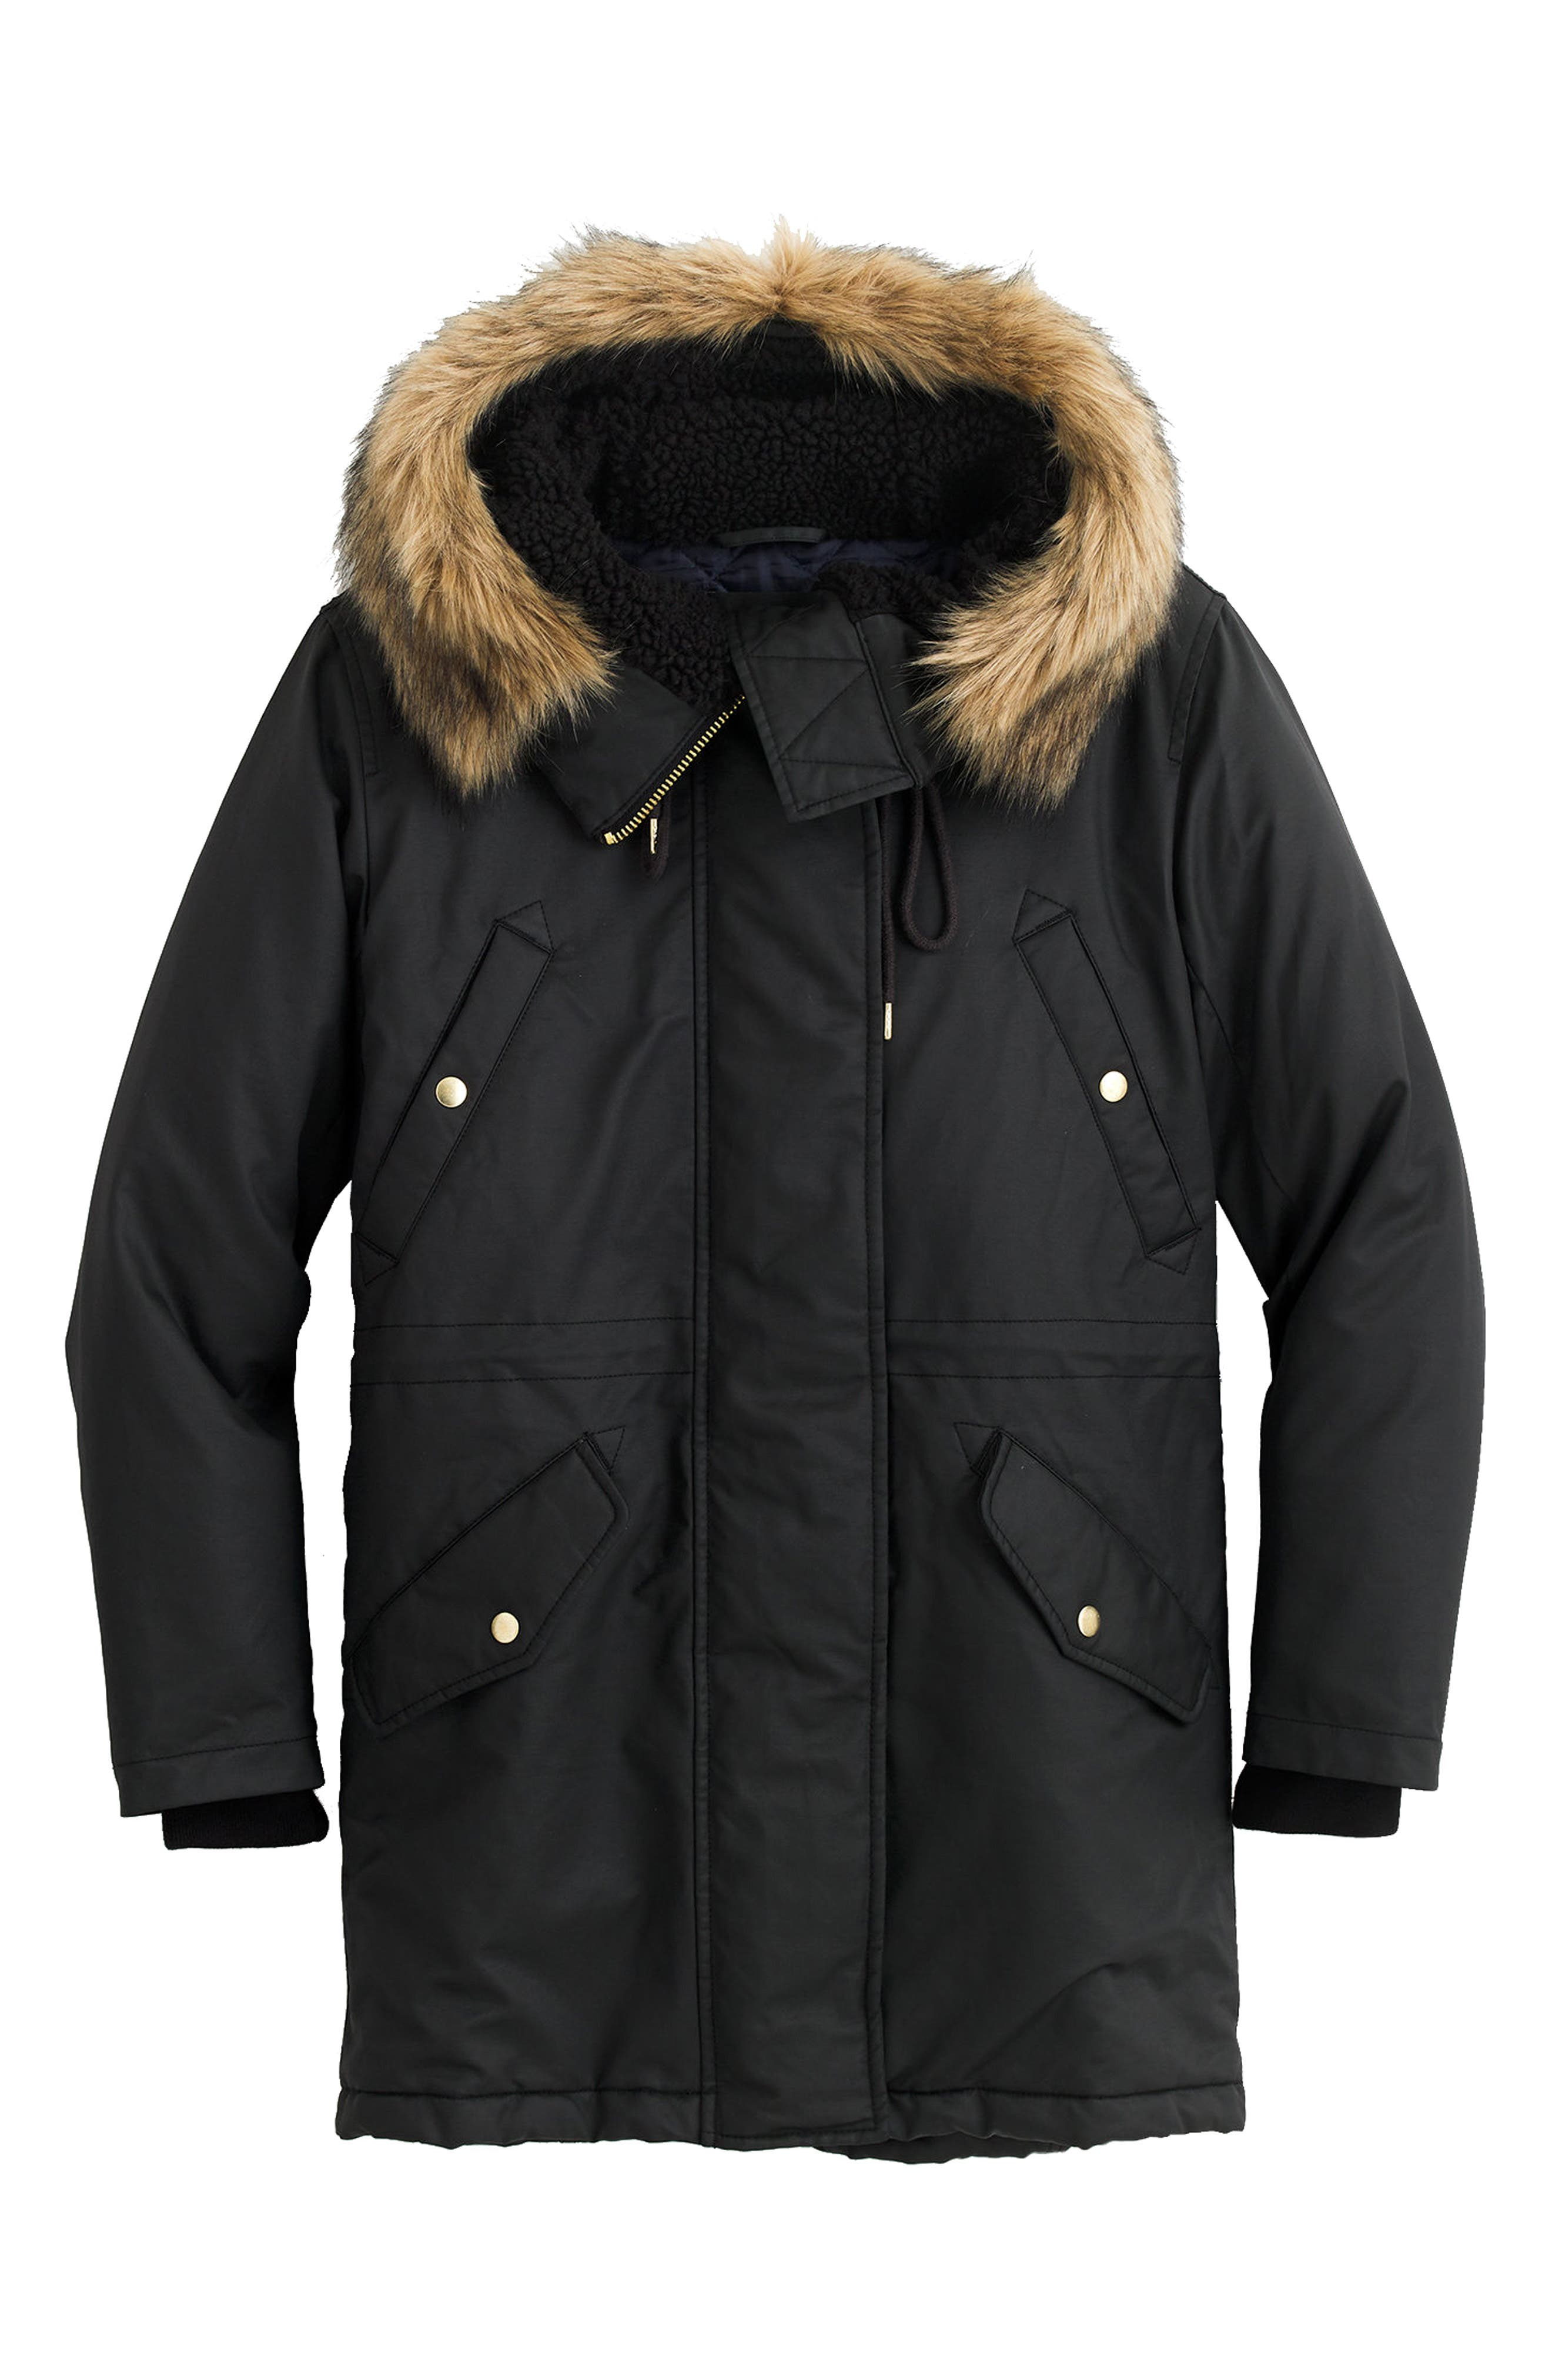 J.Crew Perfect Winter Parka with Faux Fur Trim (Regular & Petite)